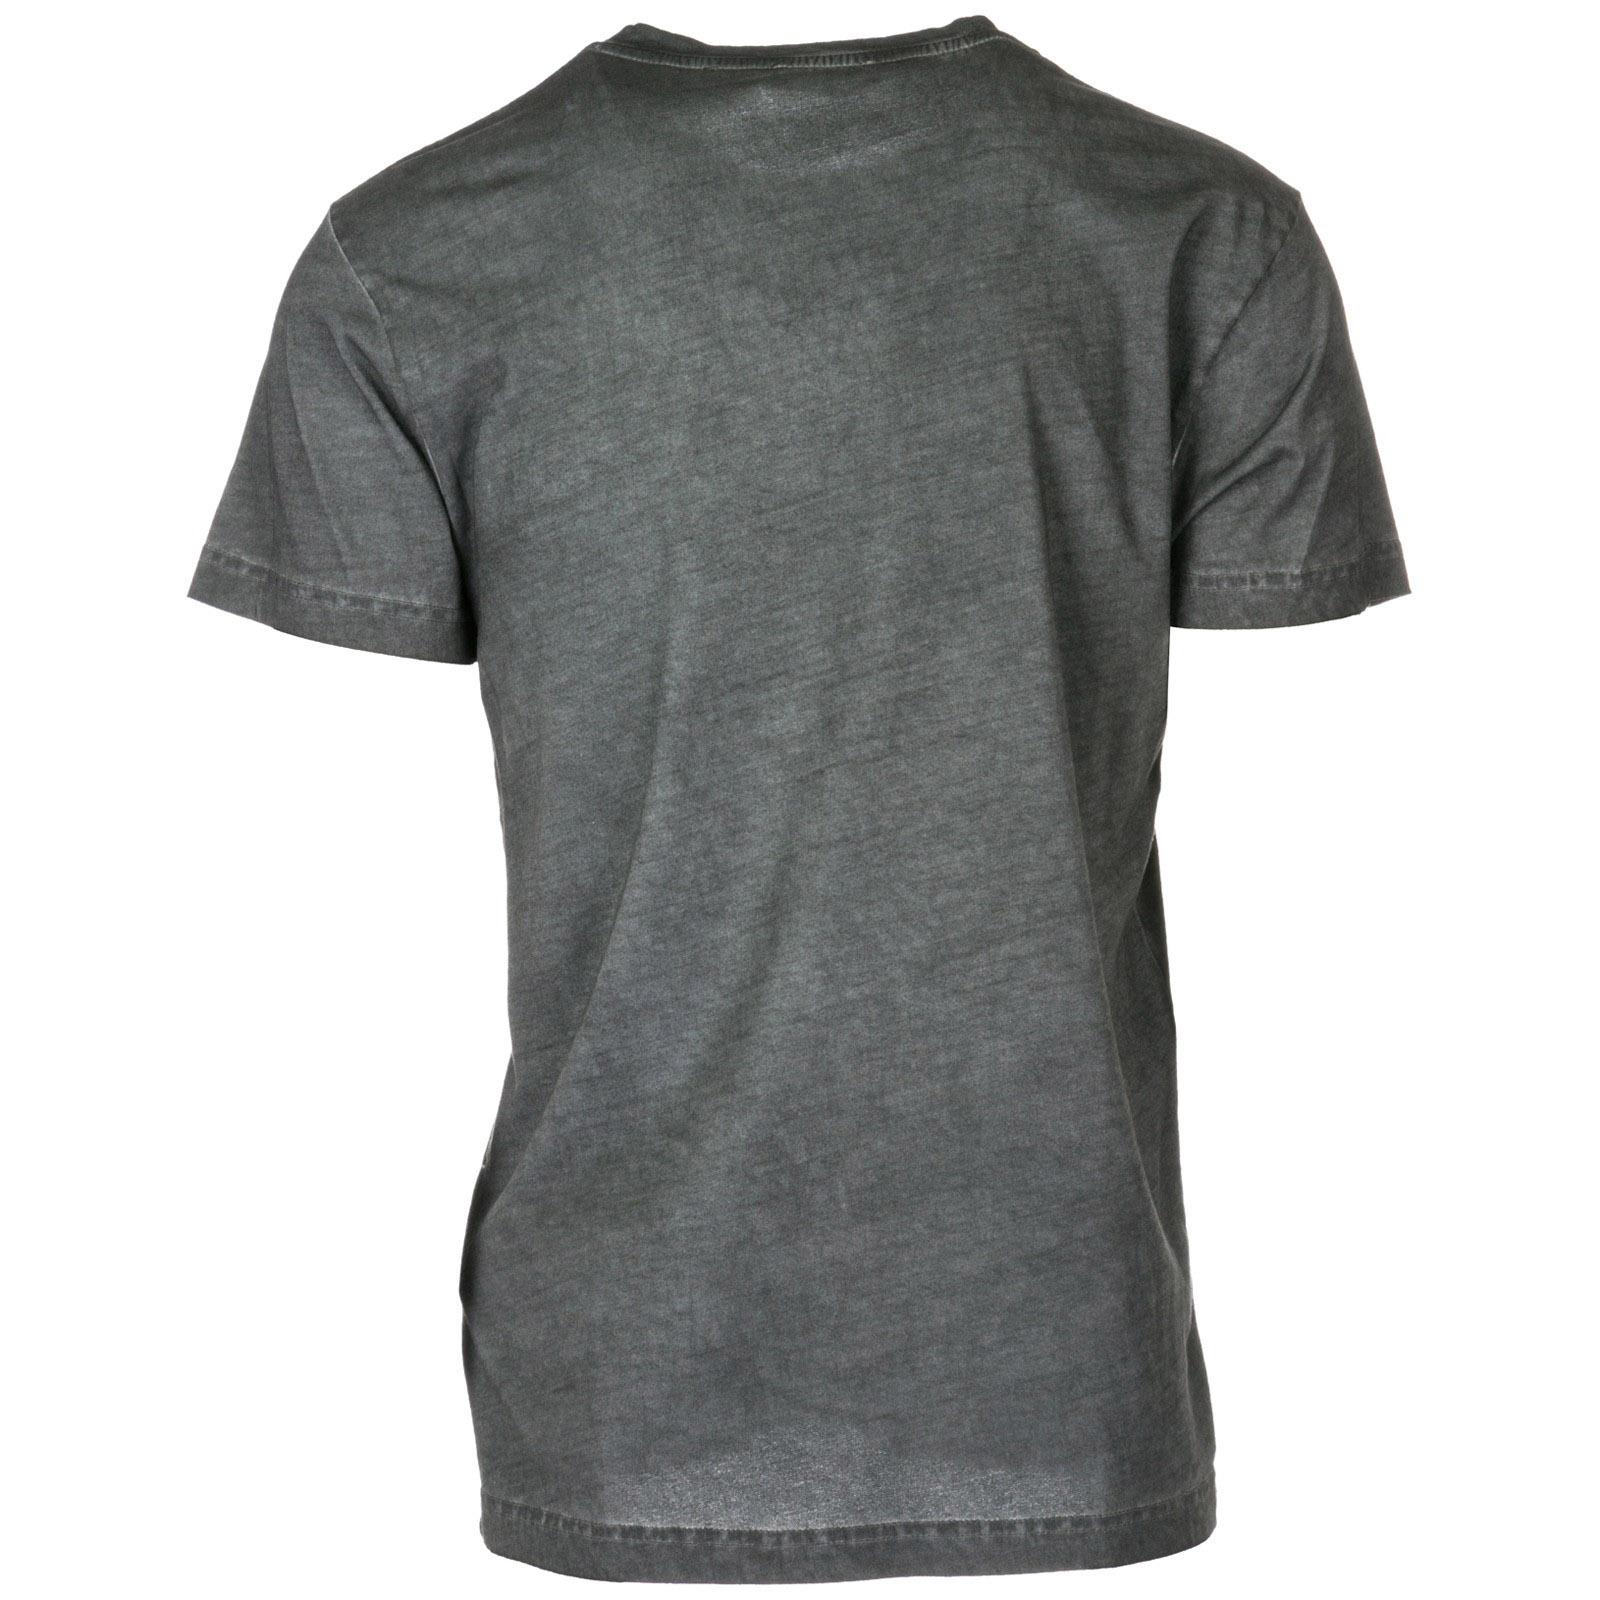 1a0f5cc1f7a1 ... Men s short sleeve t-shirt crew neckline jumper